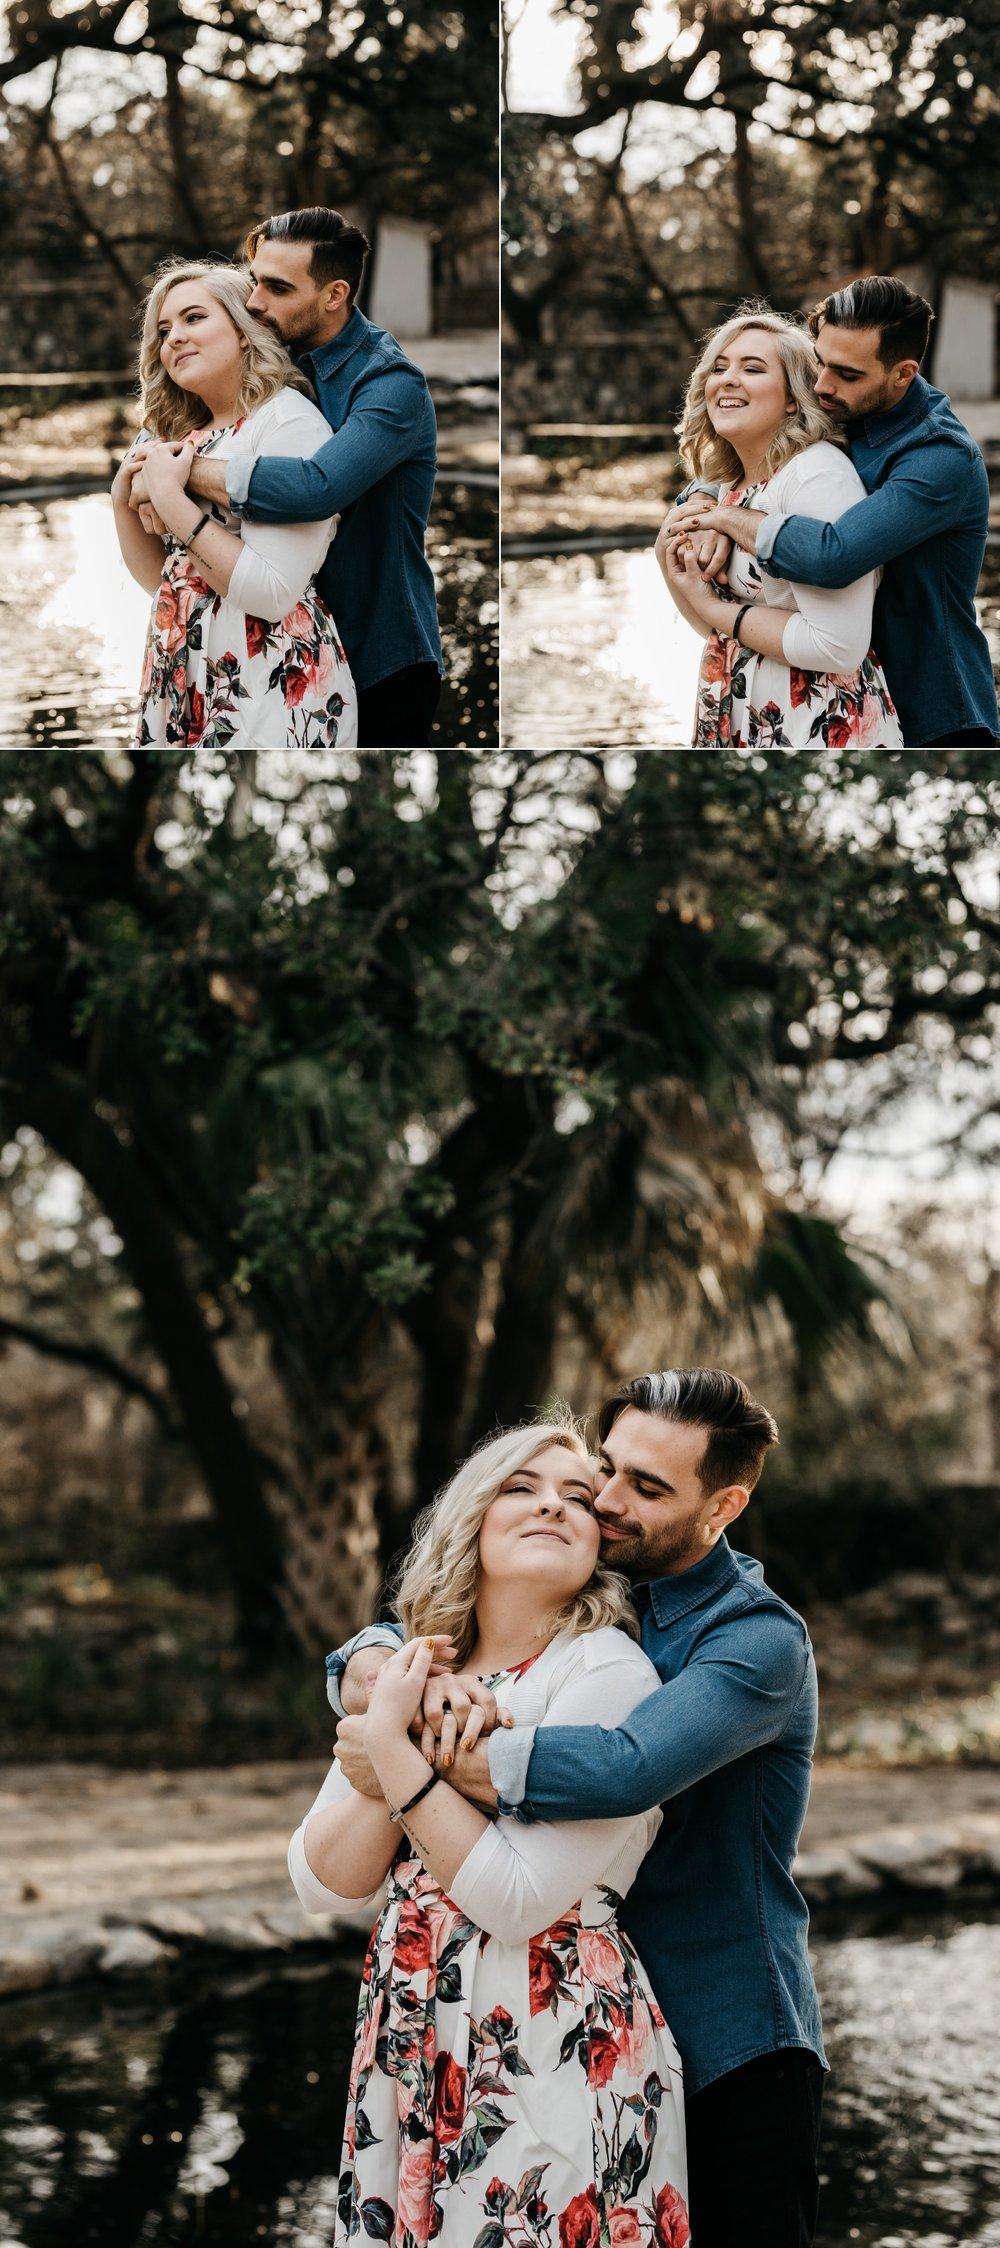 drew-andrew-texas-austin-minnesota-minneapolis-wedding-photographer-destination-elopement-intimate-adventurous_0077.jpg